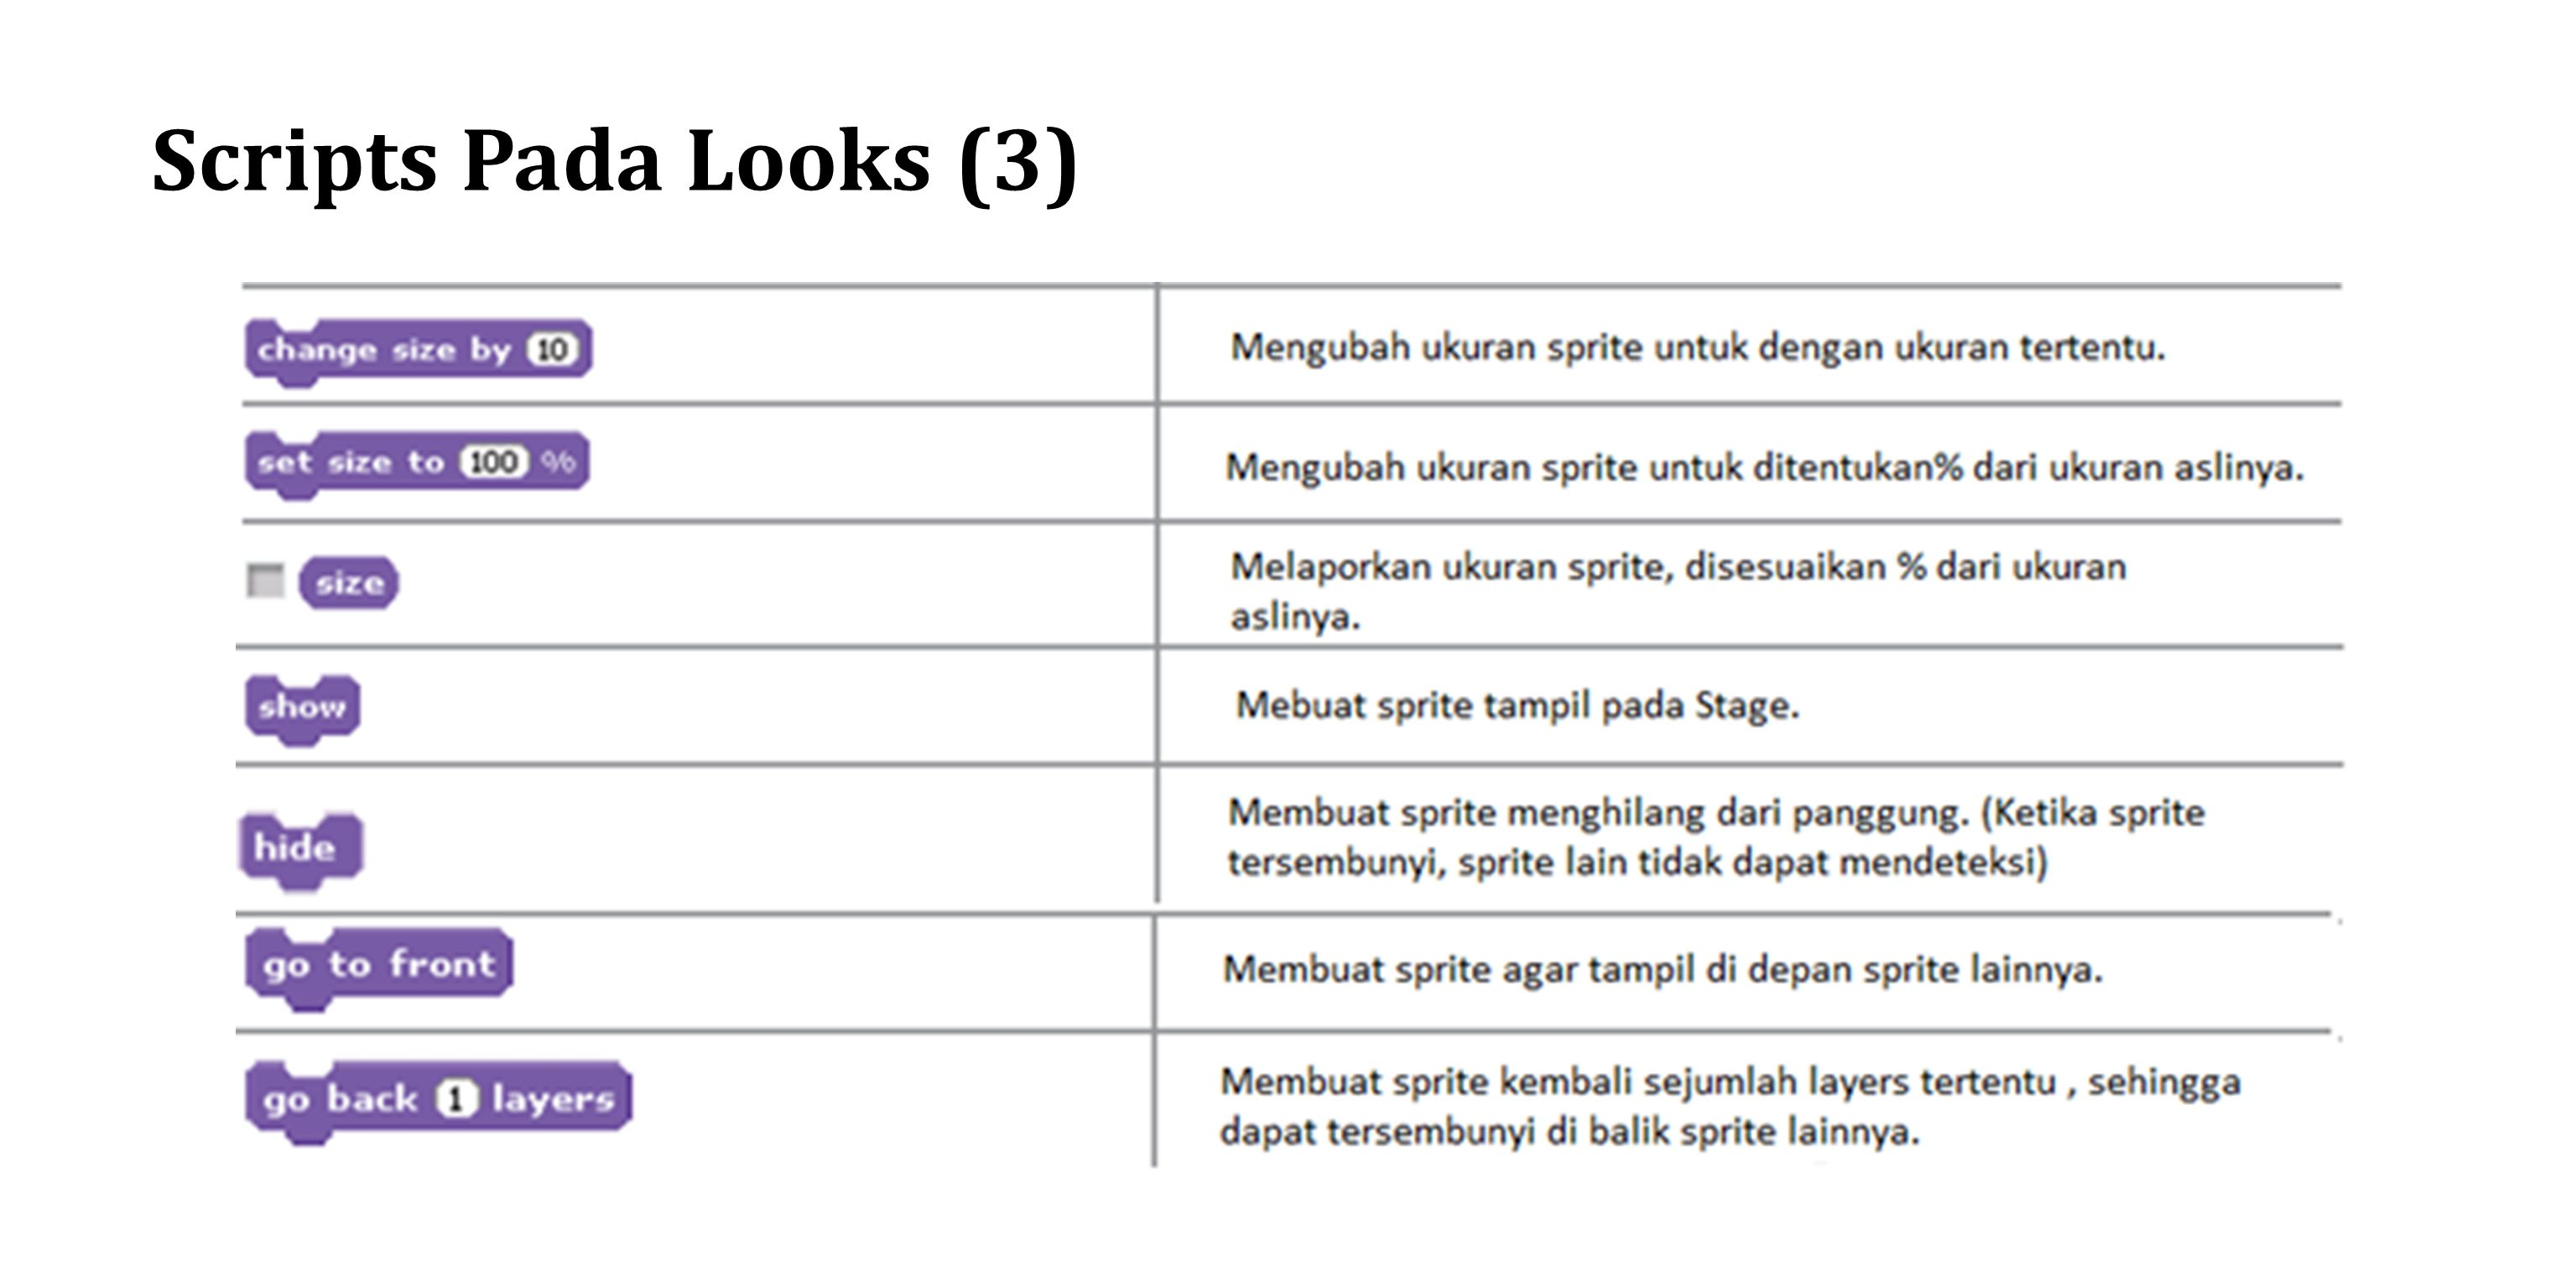 Scripts Pada Looks (3)